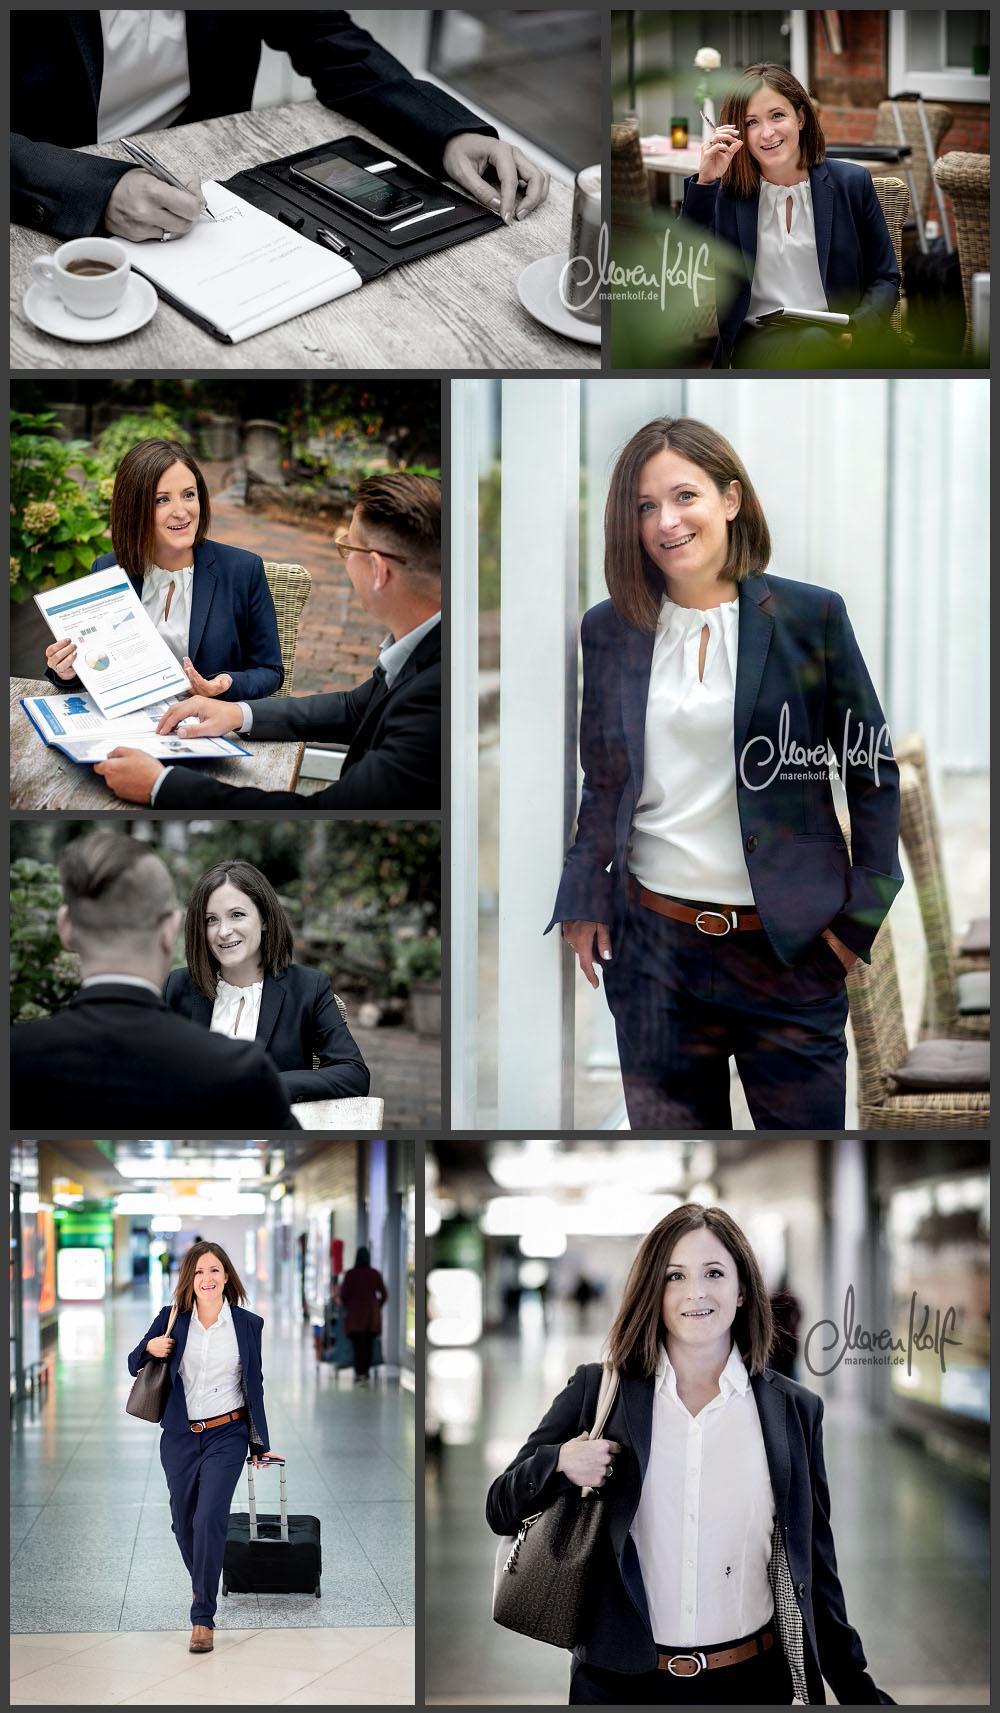 businessportraits-hannover-isernhagen-alexandra-kese-personality-portrait-maren-kolf-fotografie